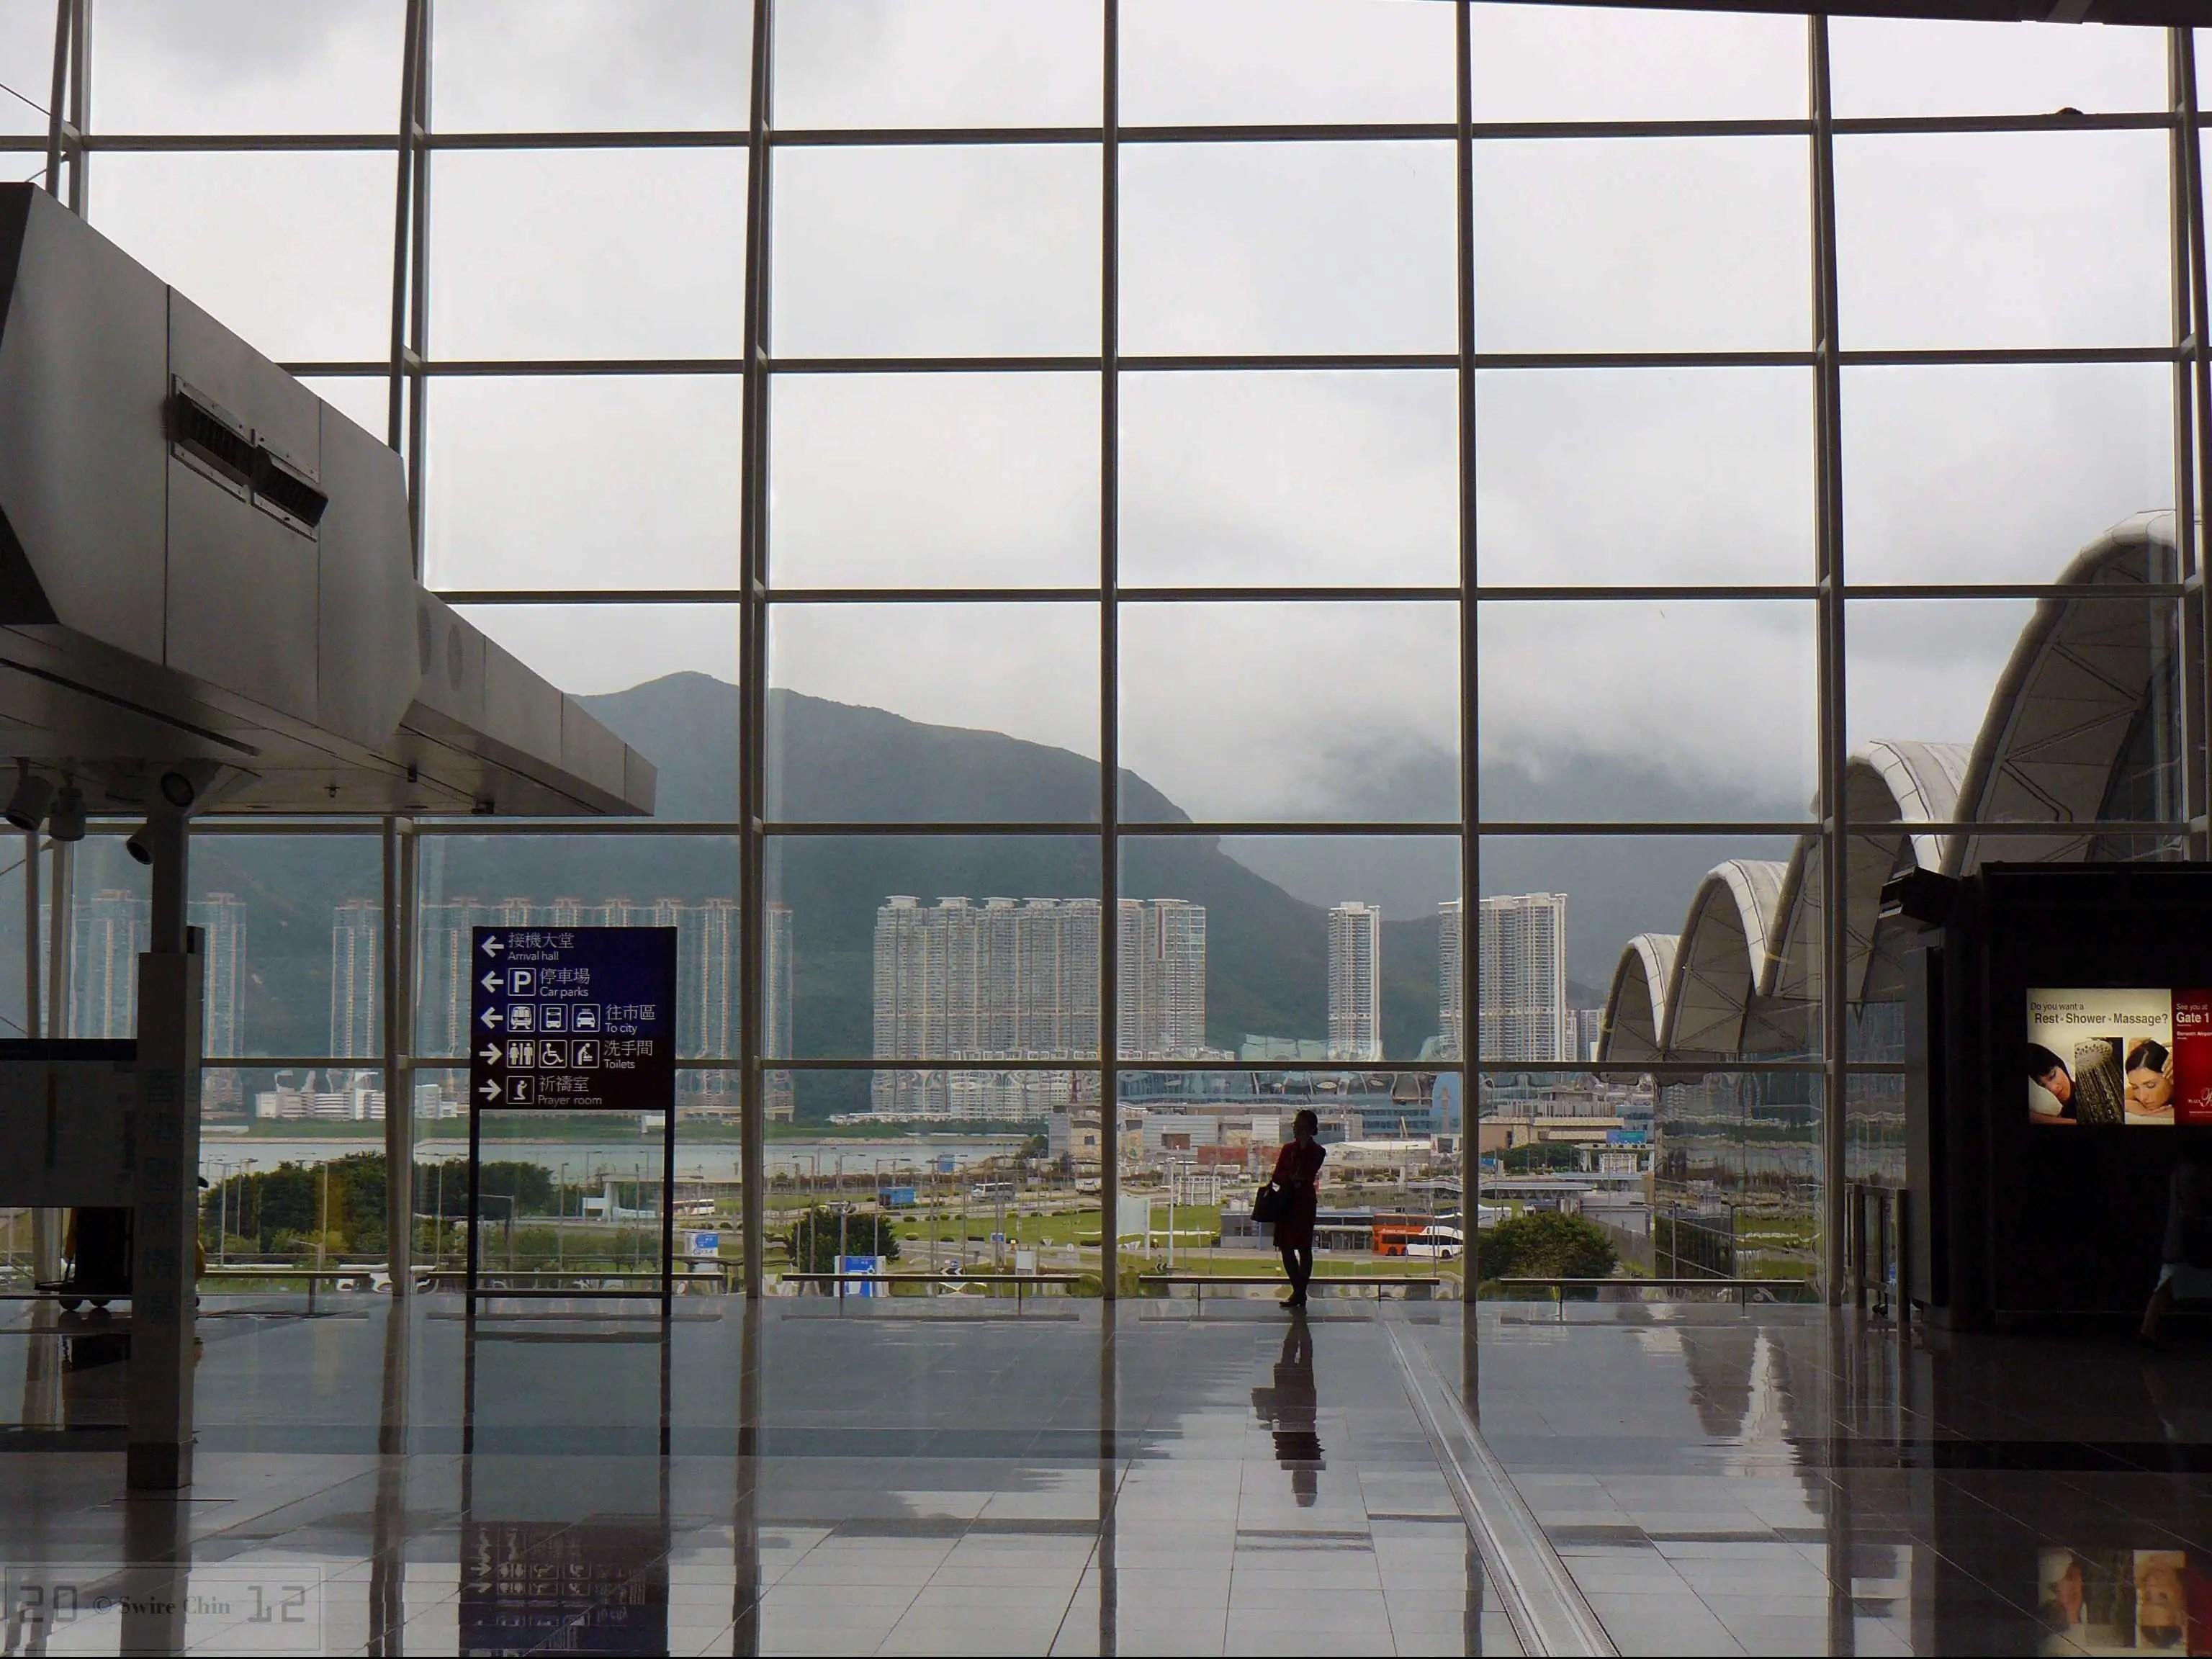 4. Hong Kong International Airport (HKG)